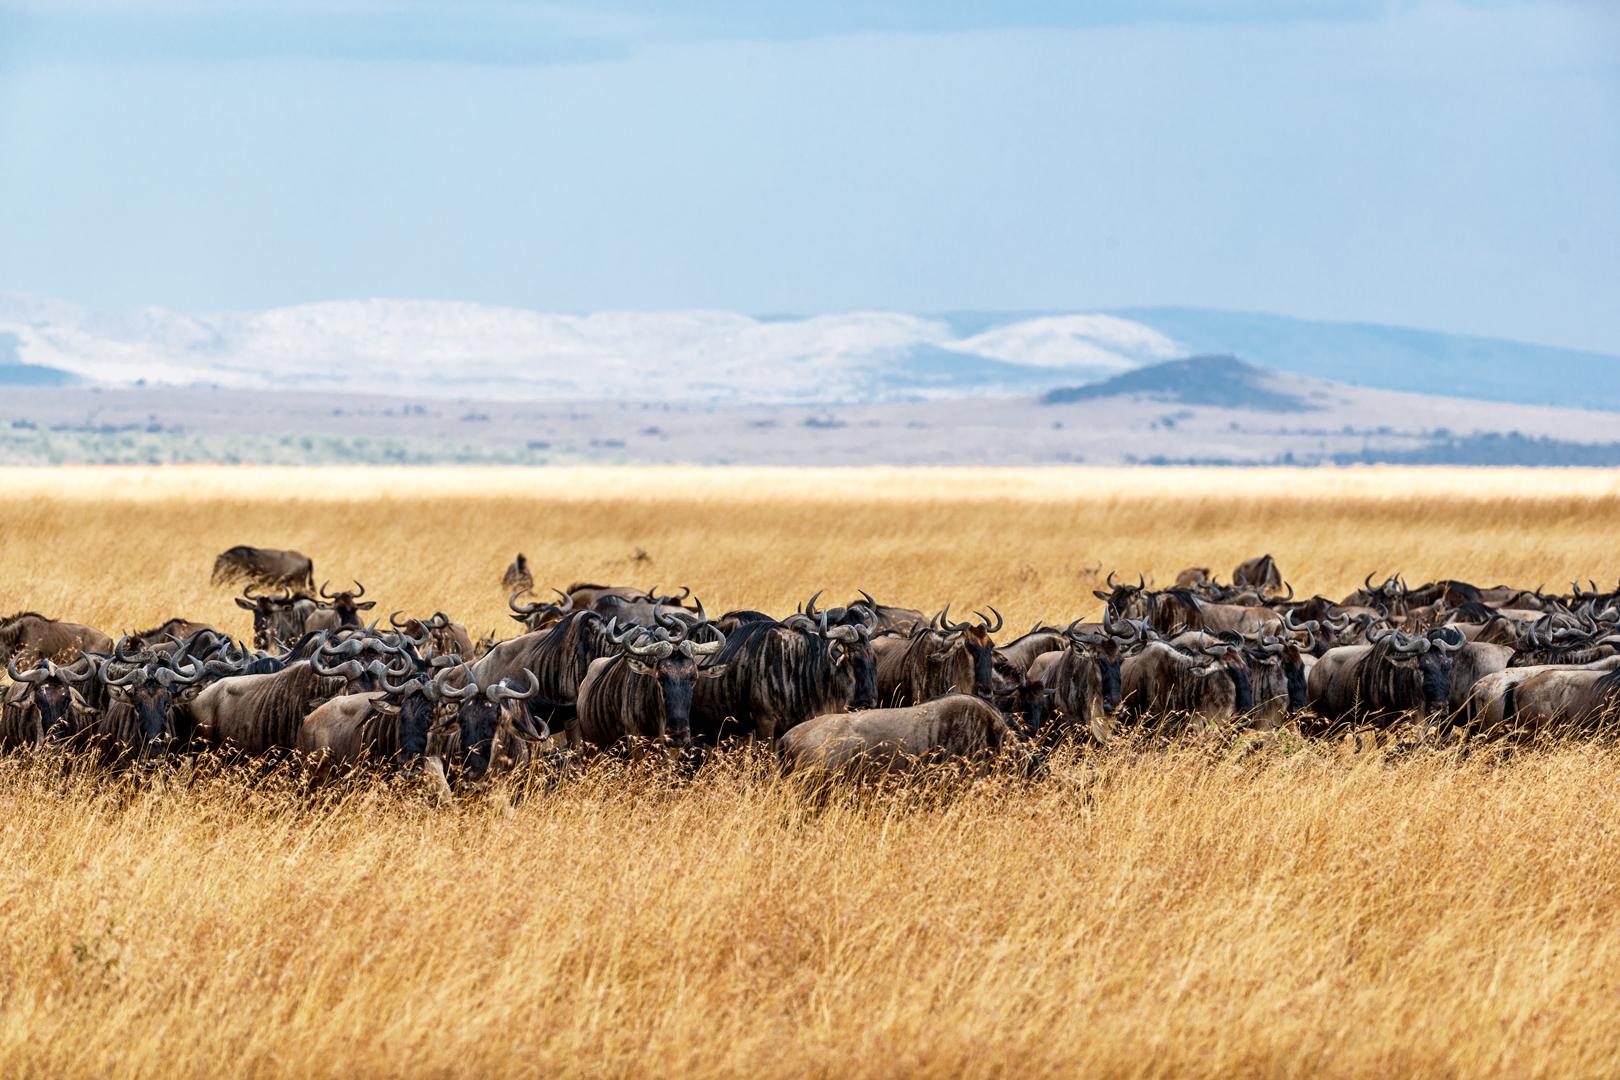 Herd of Buffalo in Tall Kenya Grass.jpg